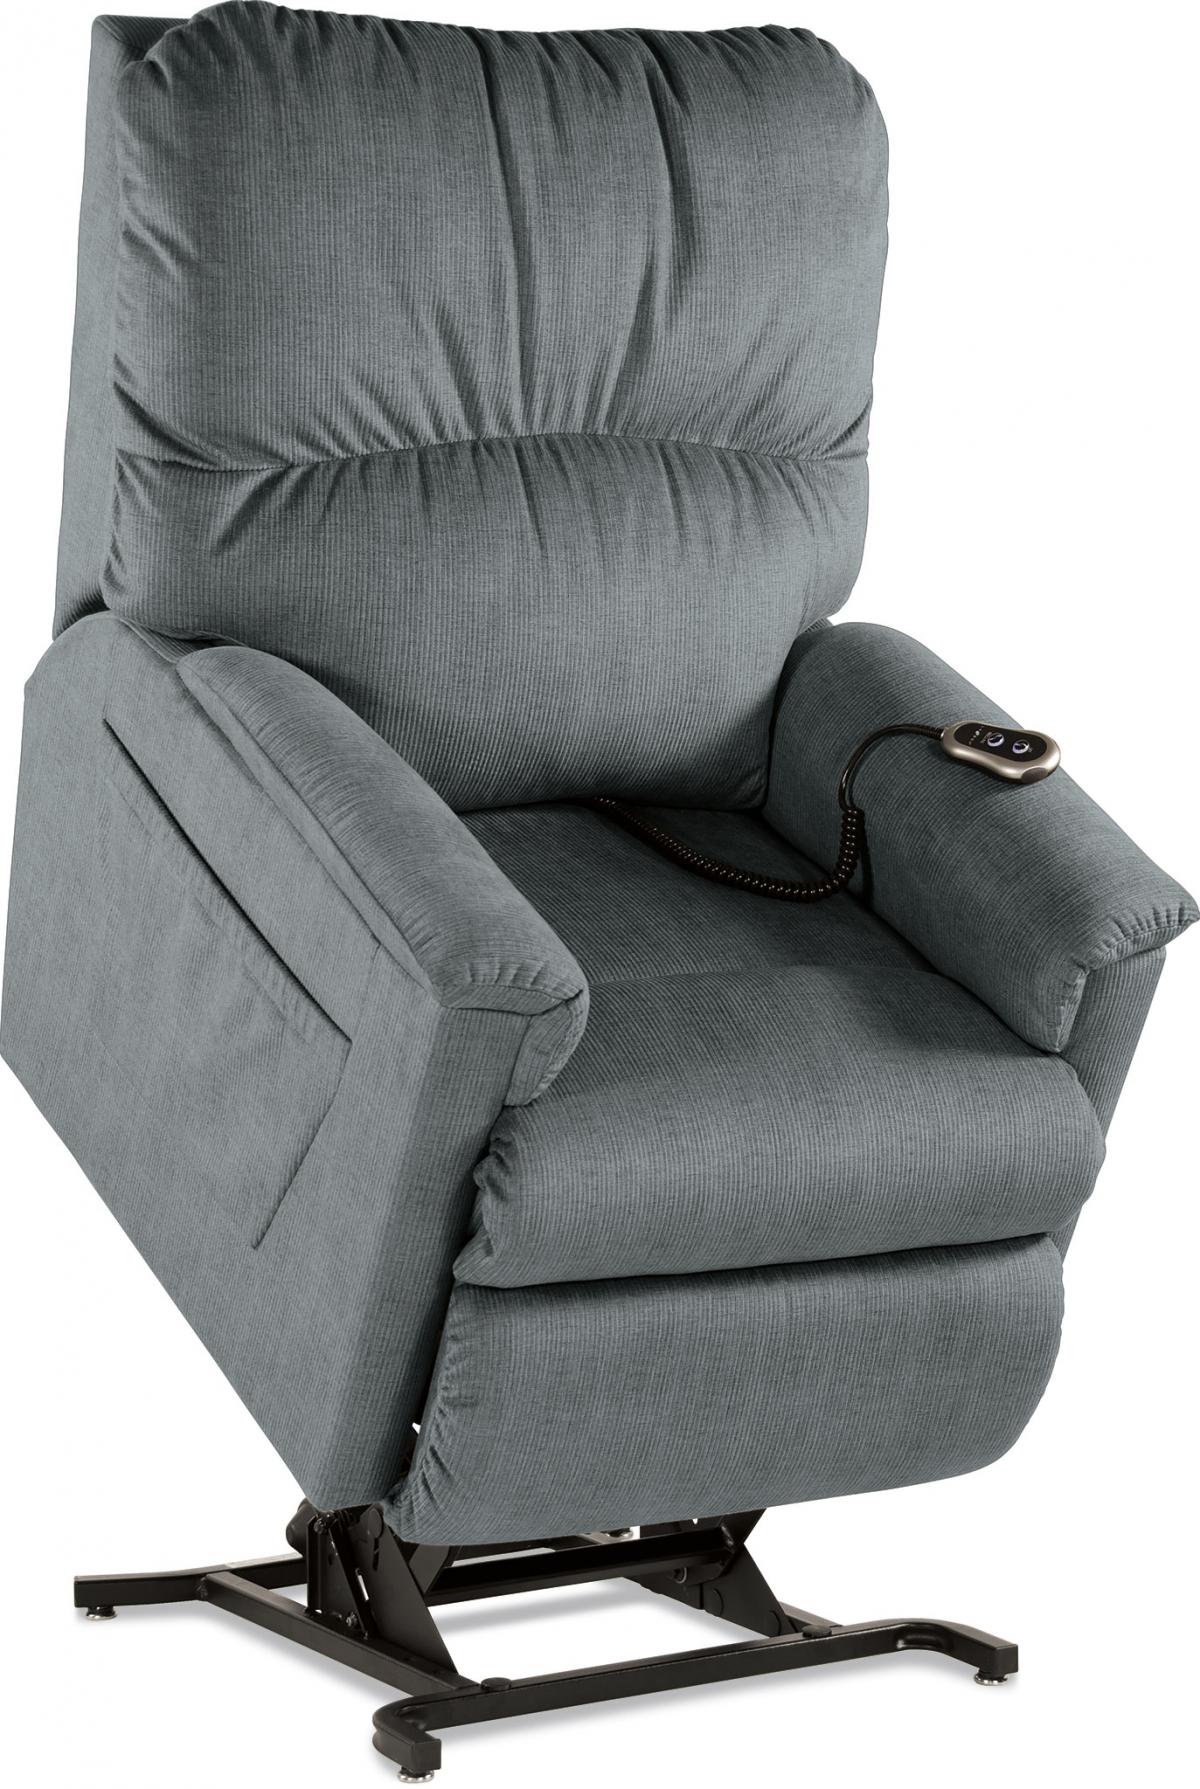 Mcmillin S Furniture Has The La Z Boy 2bl 791 Bronze Power